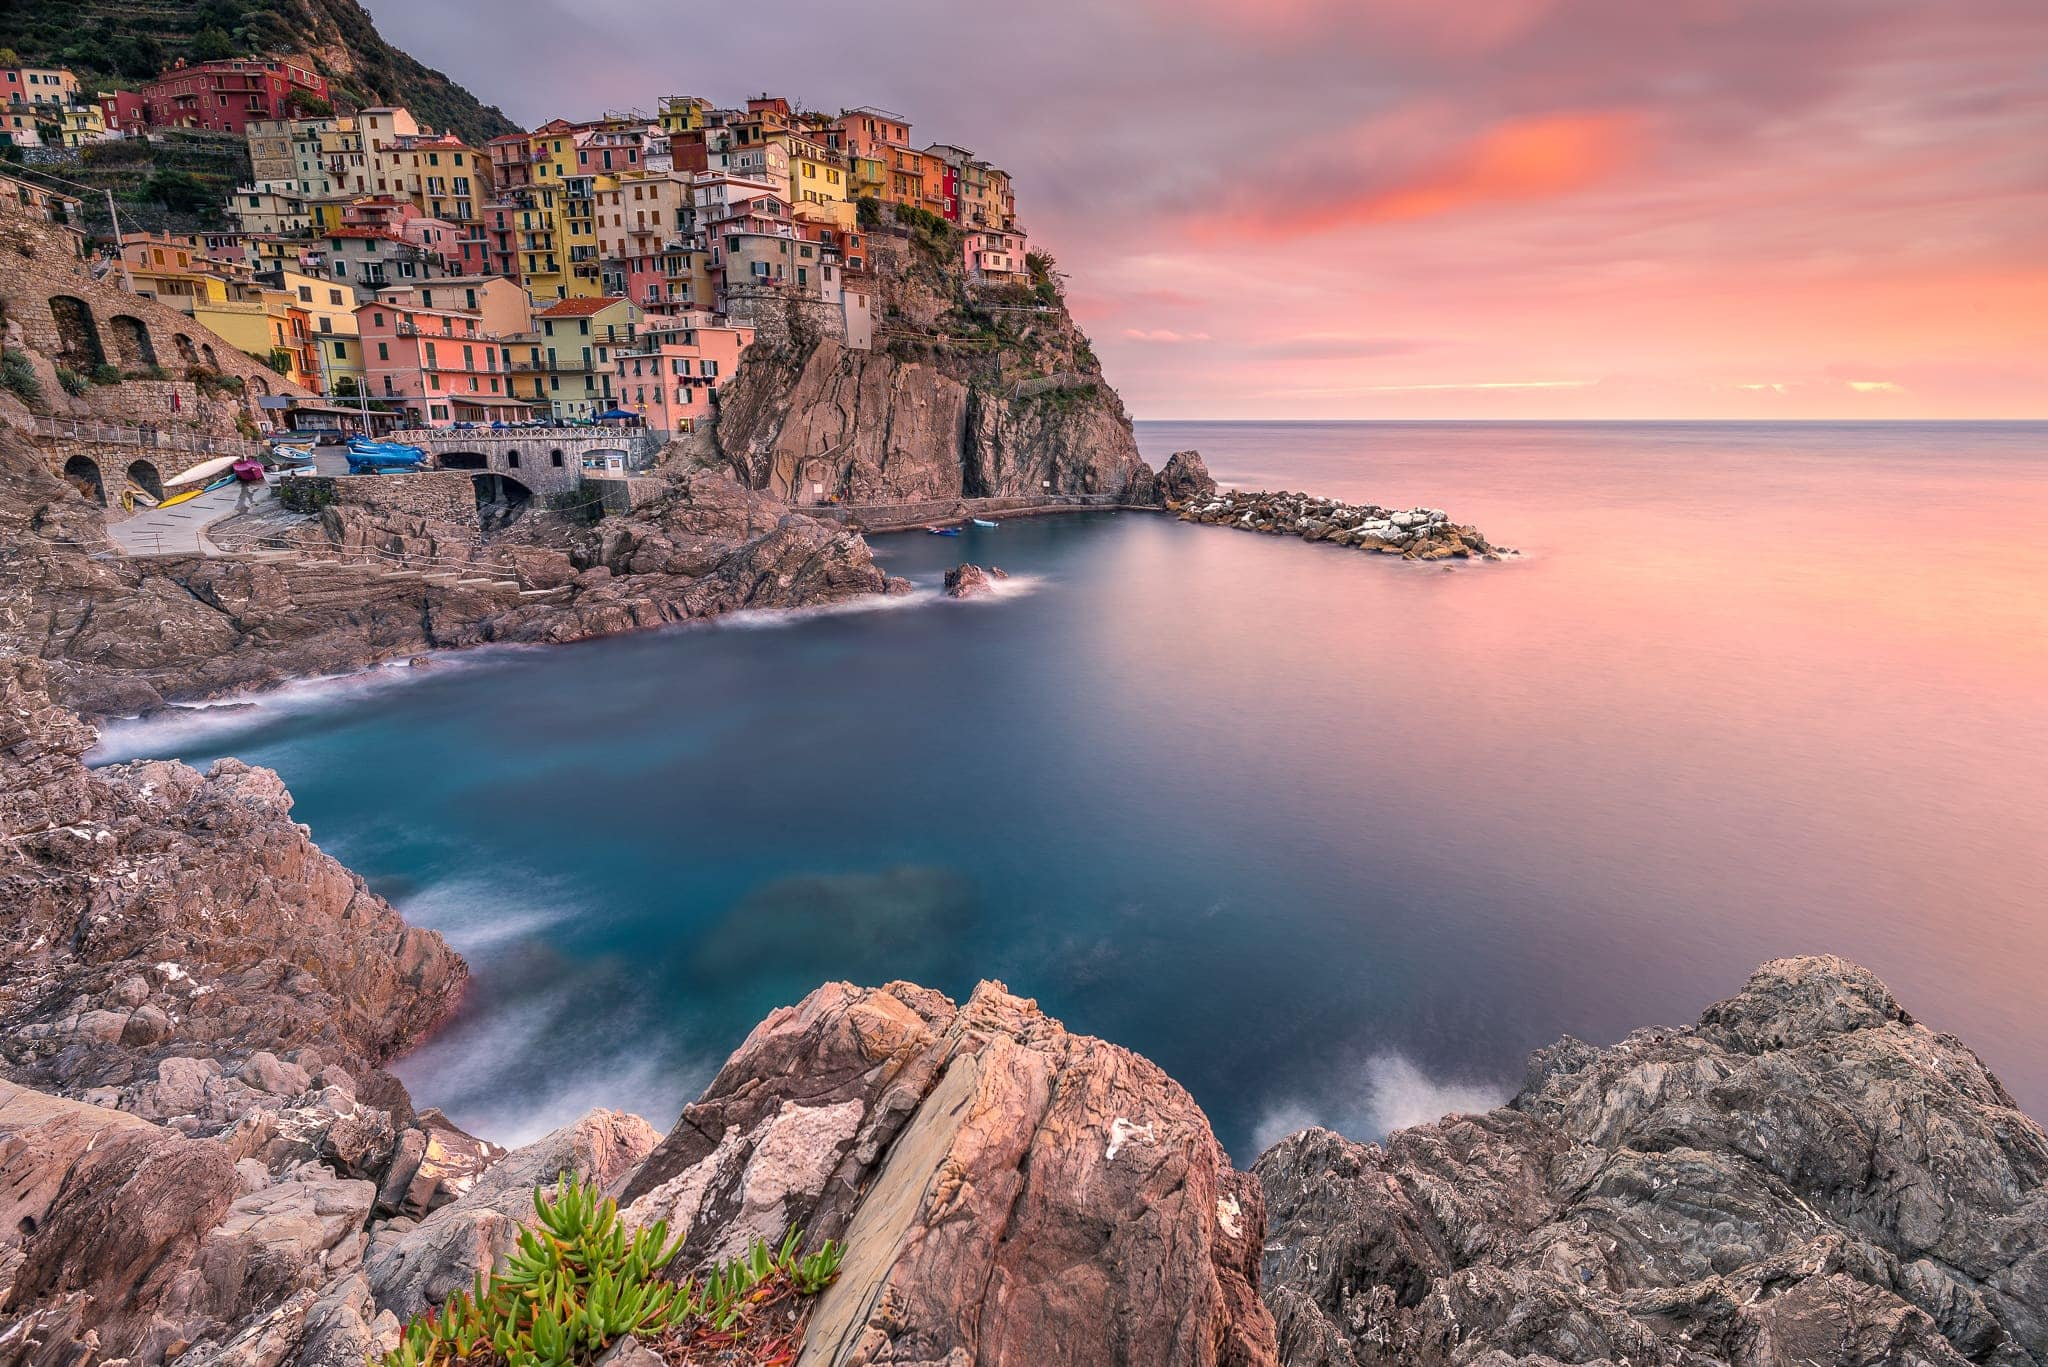 Francesco Gola Seascape Landscape Photography Liguria Manarola Cinque Terre Sunset Long Exposure